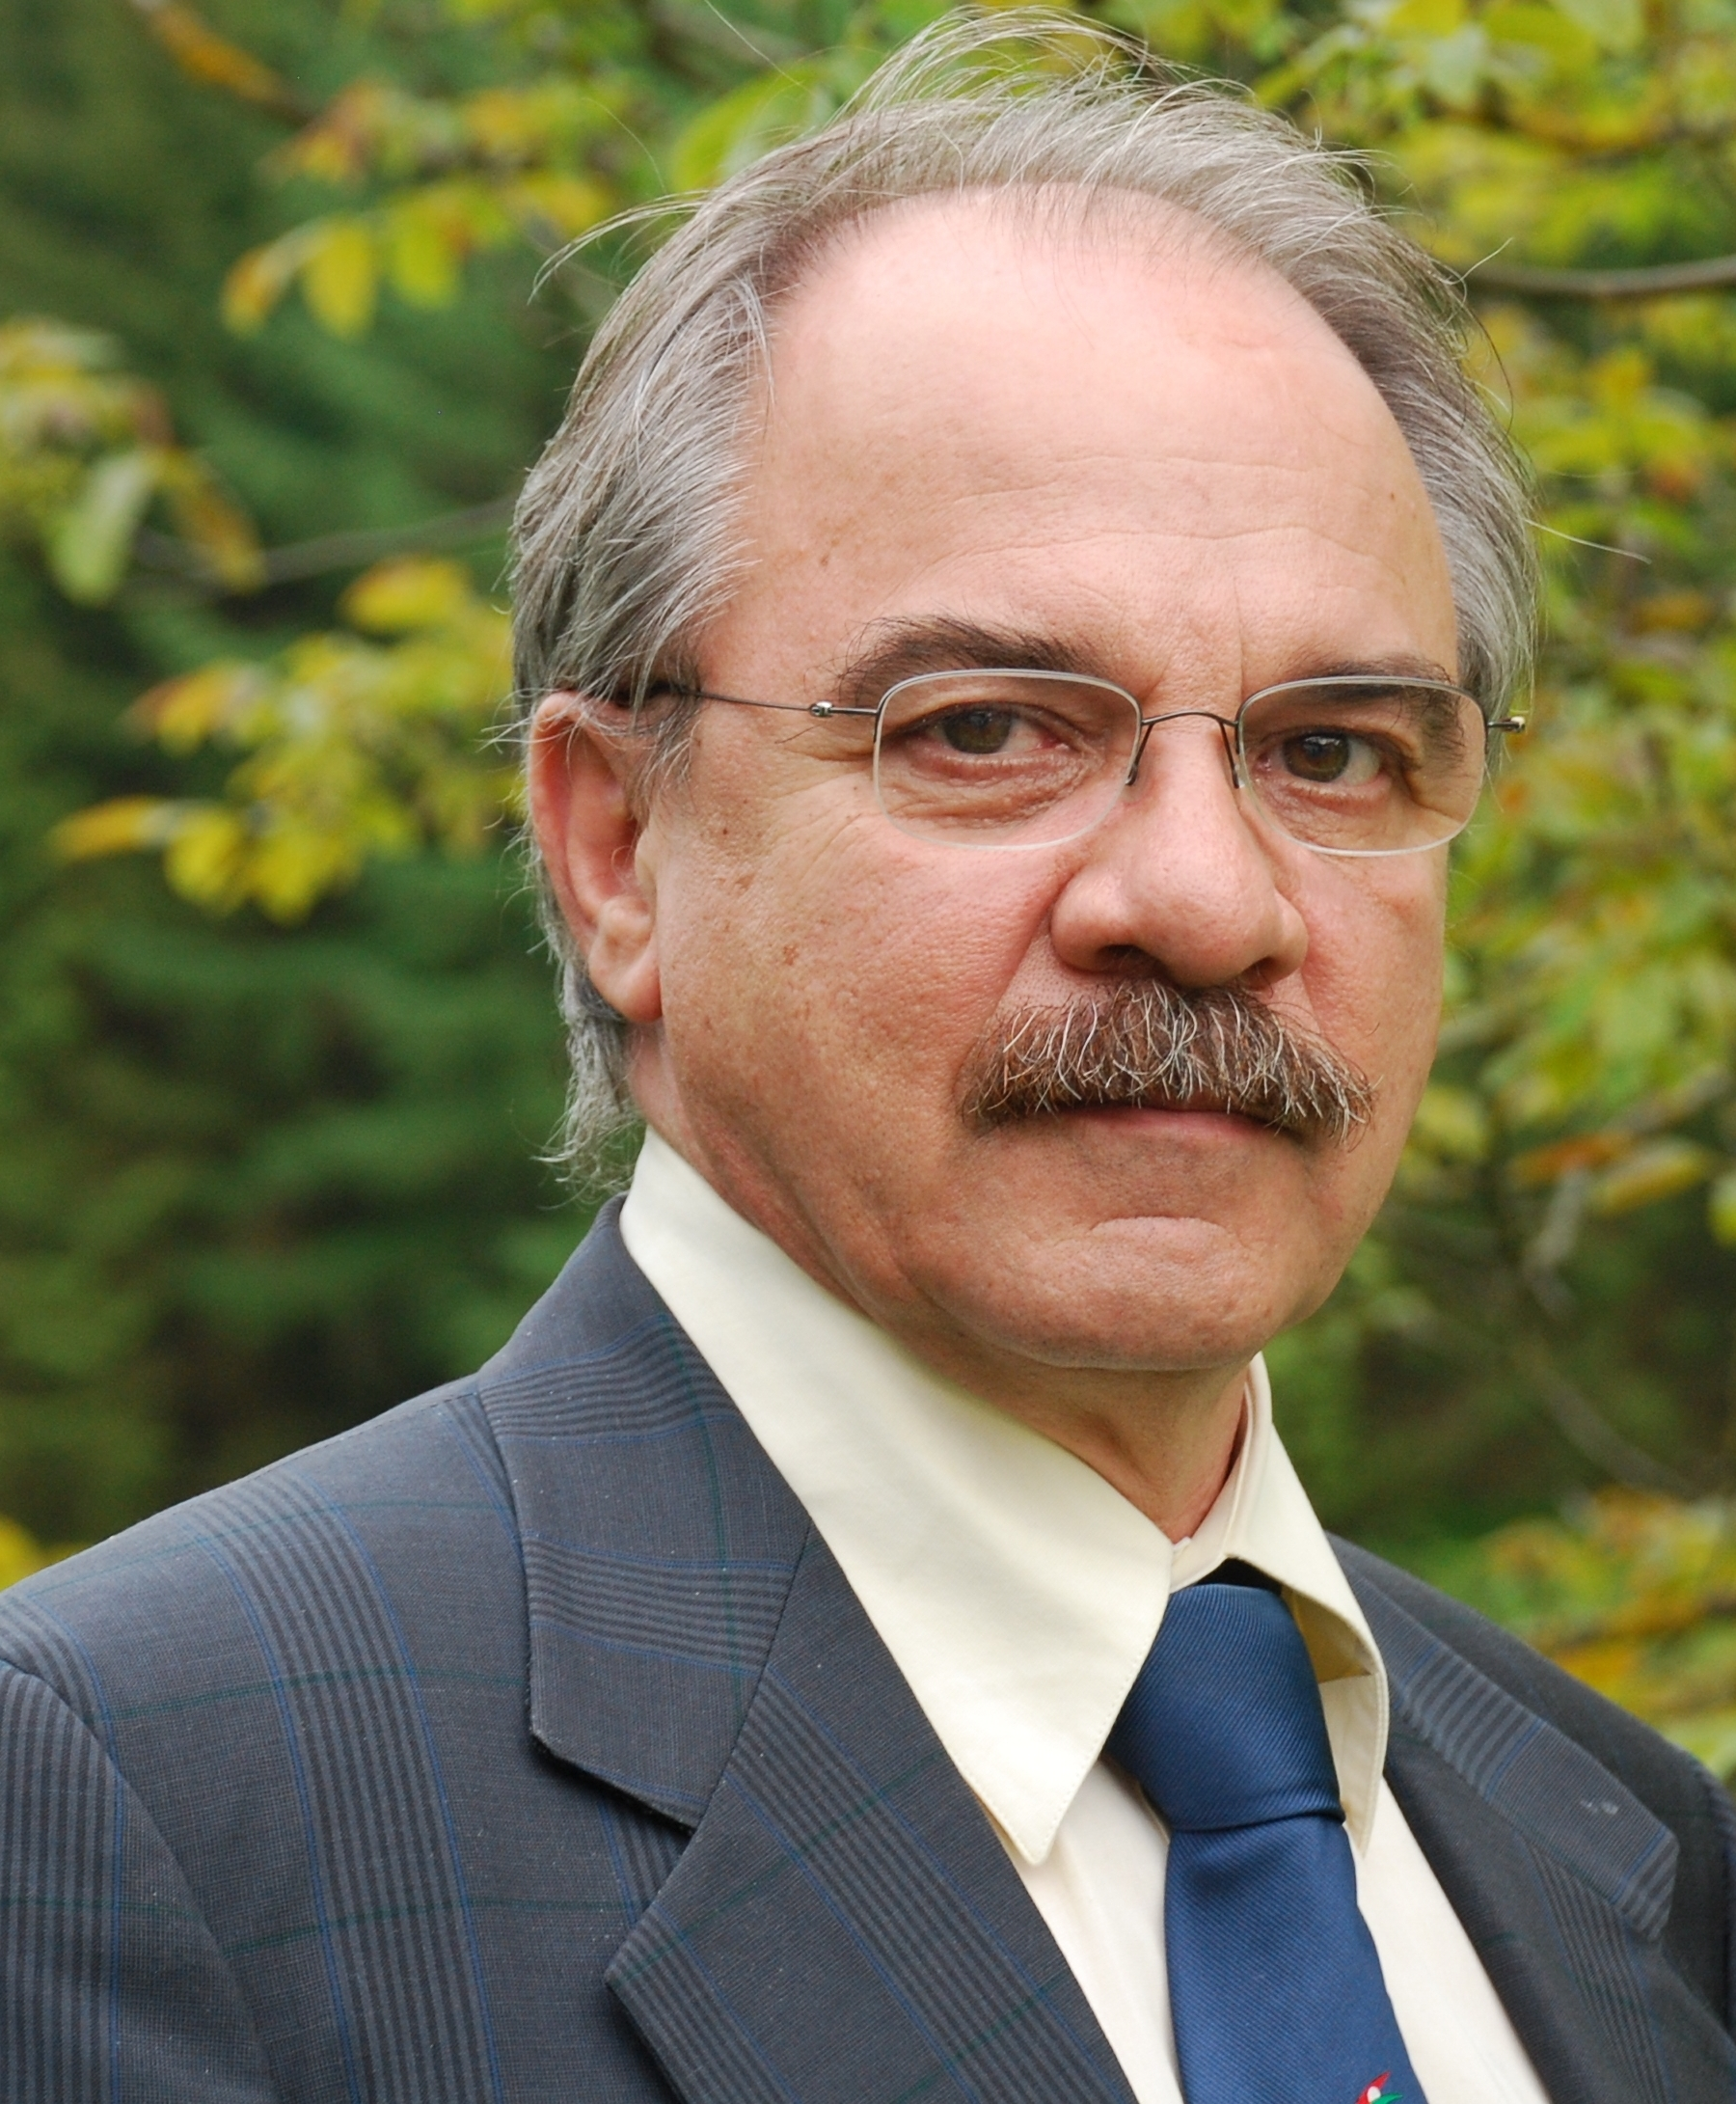 Professor Guido F Fumagalli